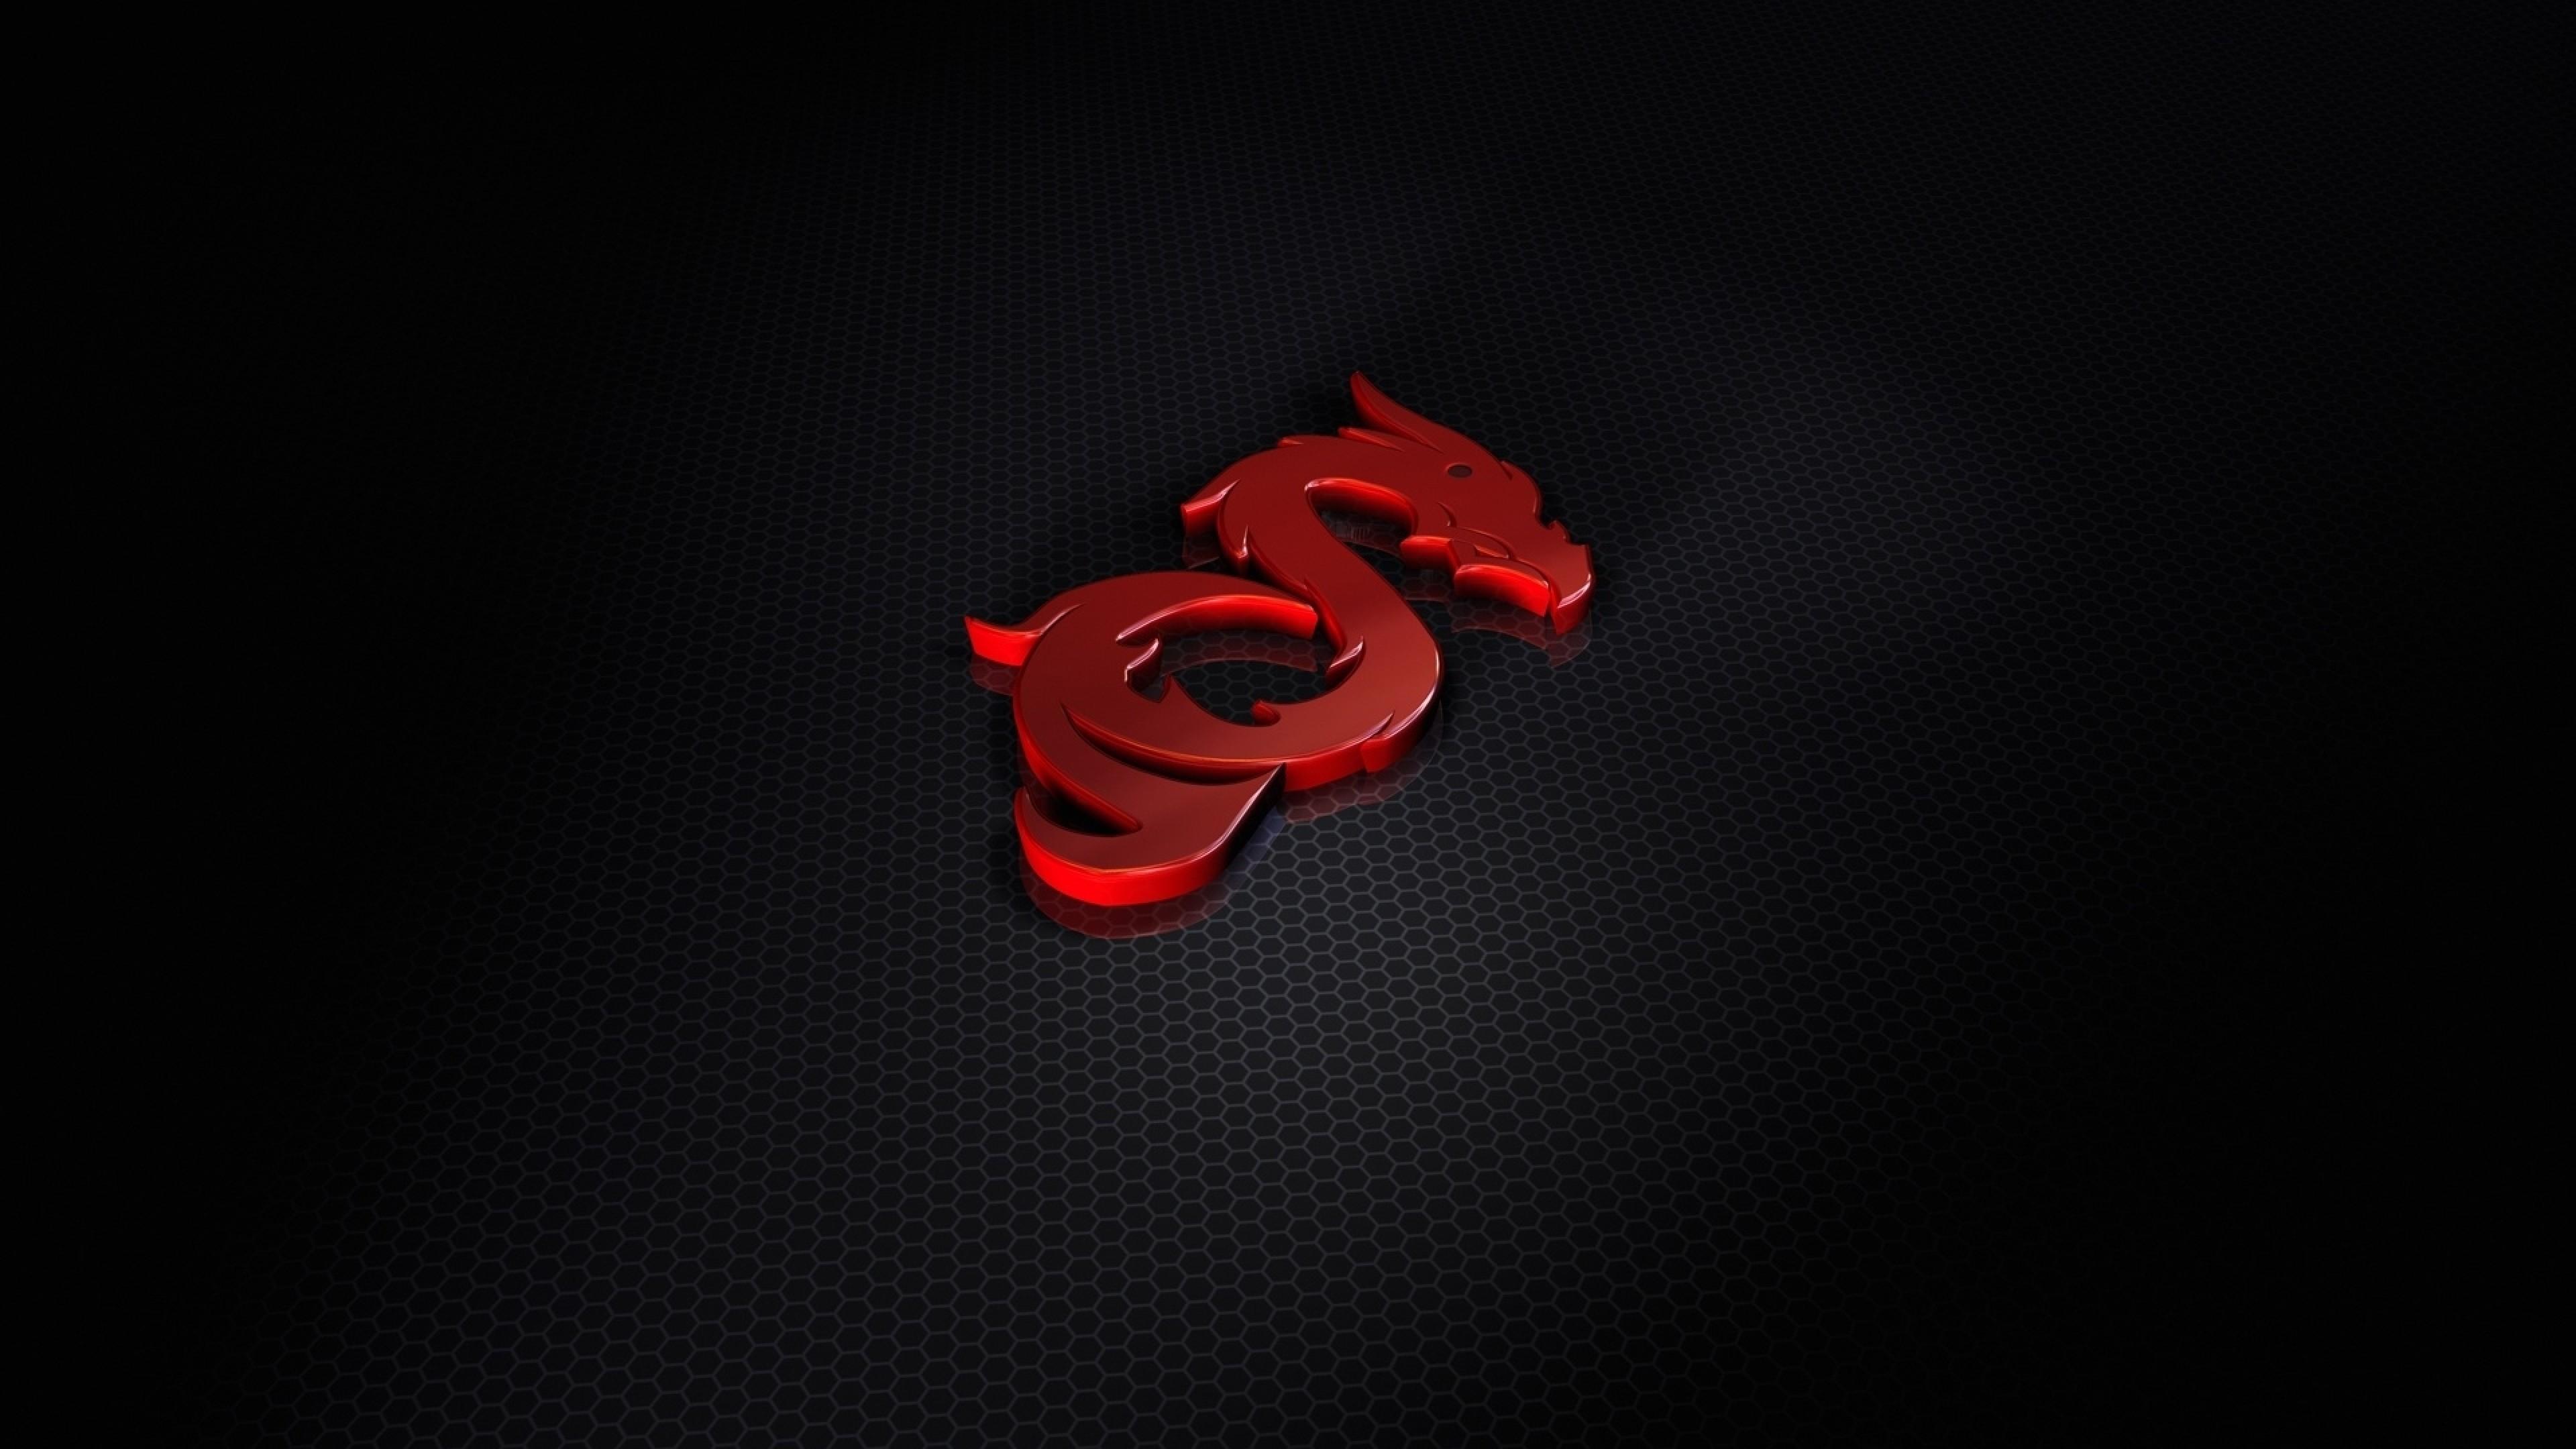 Wallpaper dragon, symbol, surface